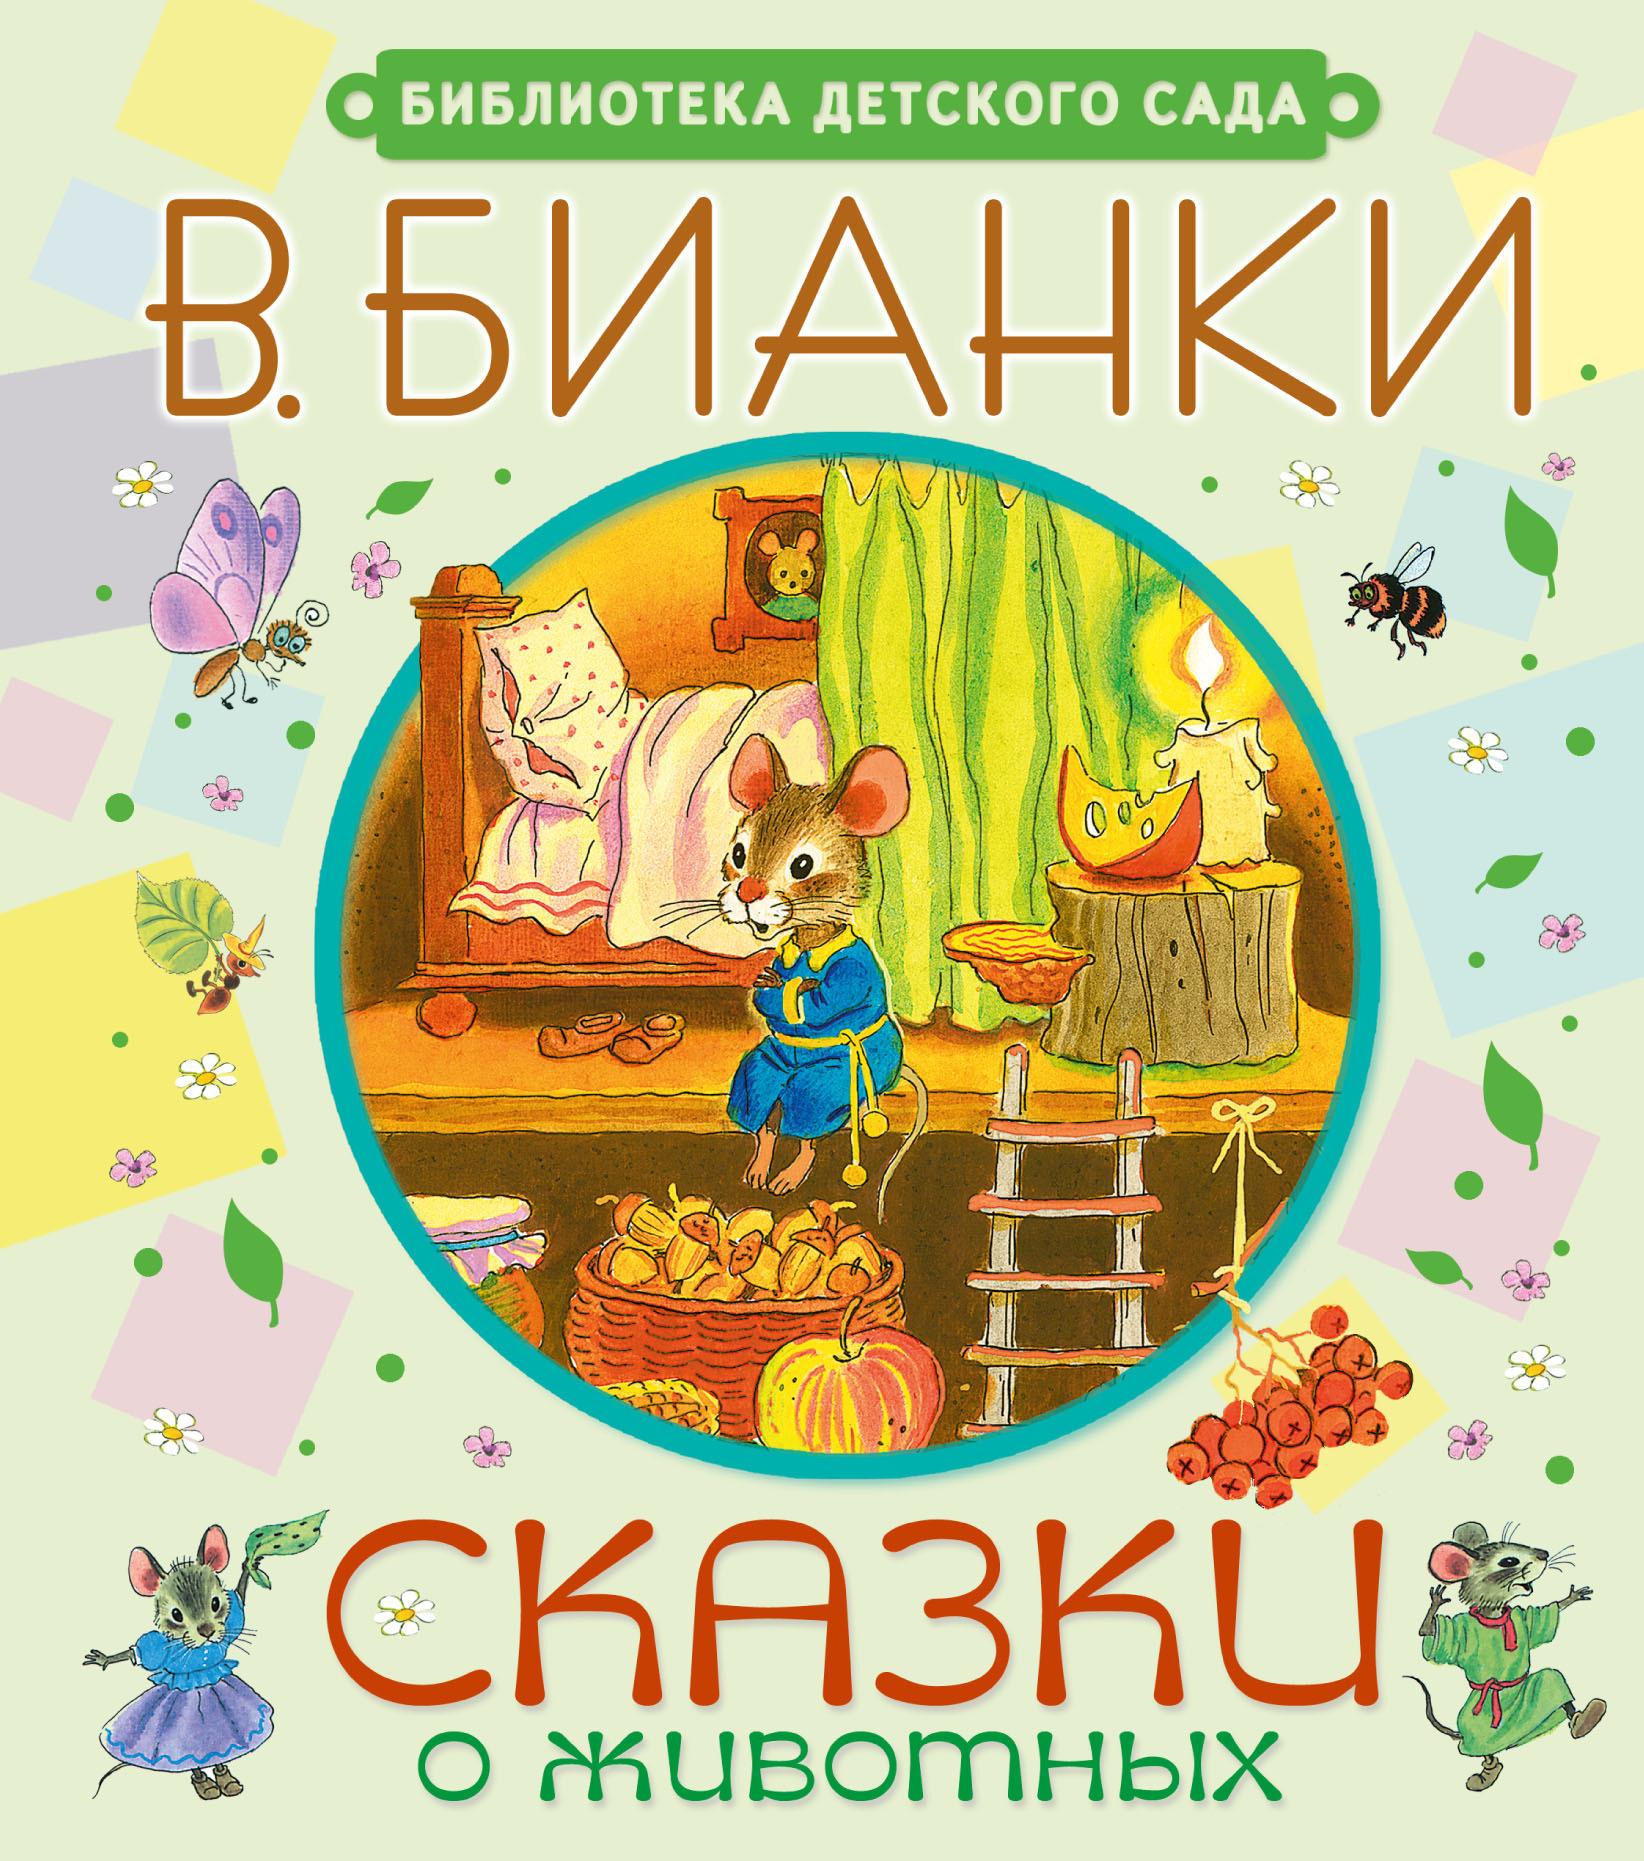 Виталий Бианки Сказки о животных виталий бианки большая книга сказок